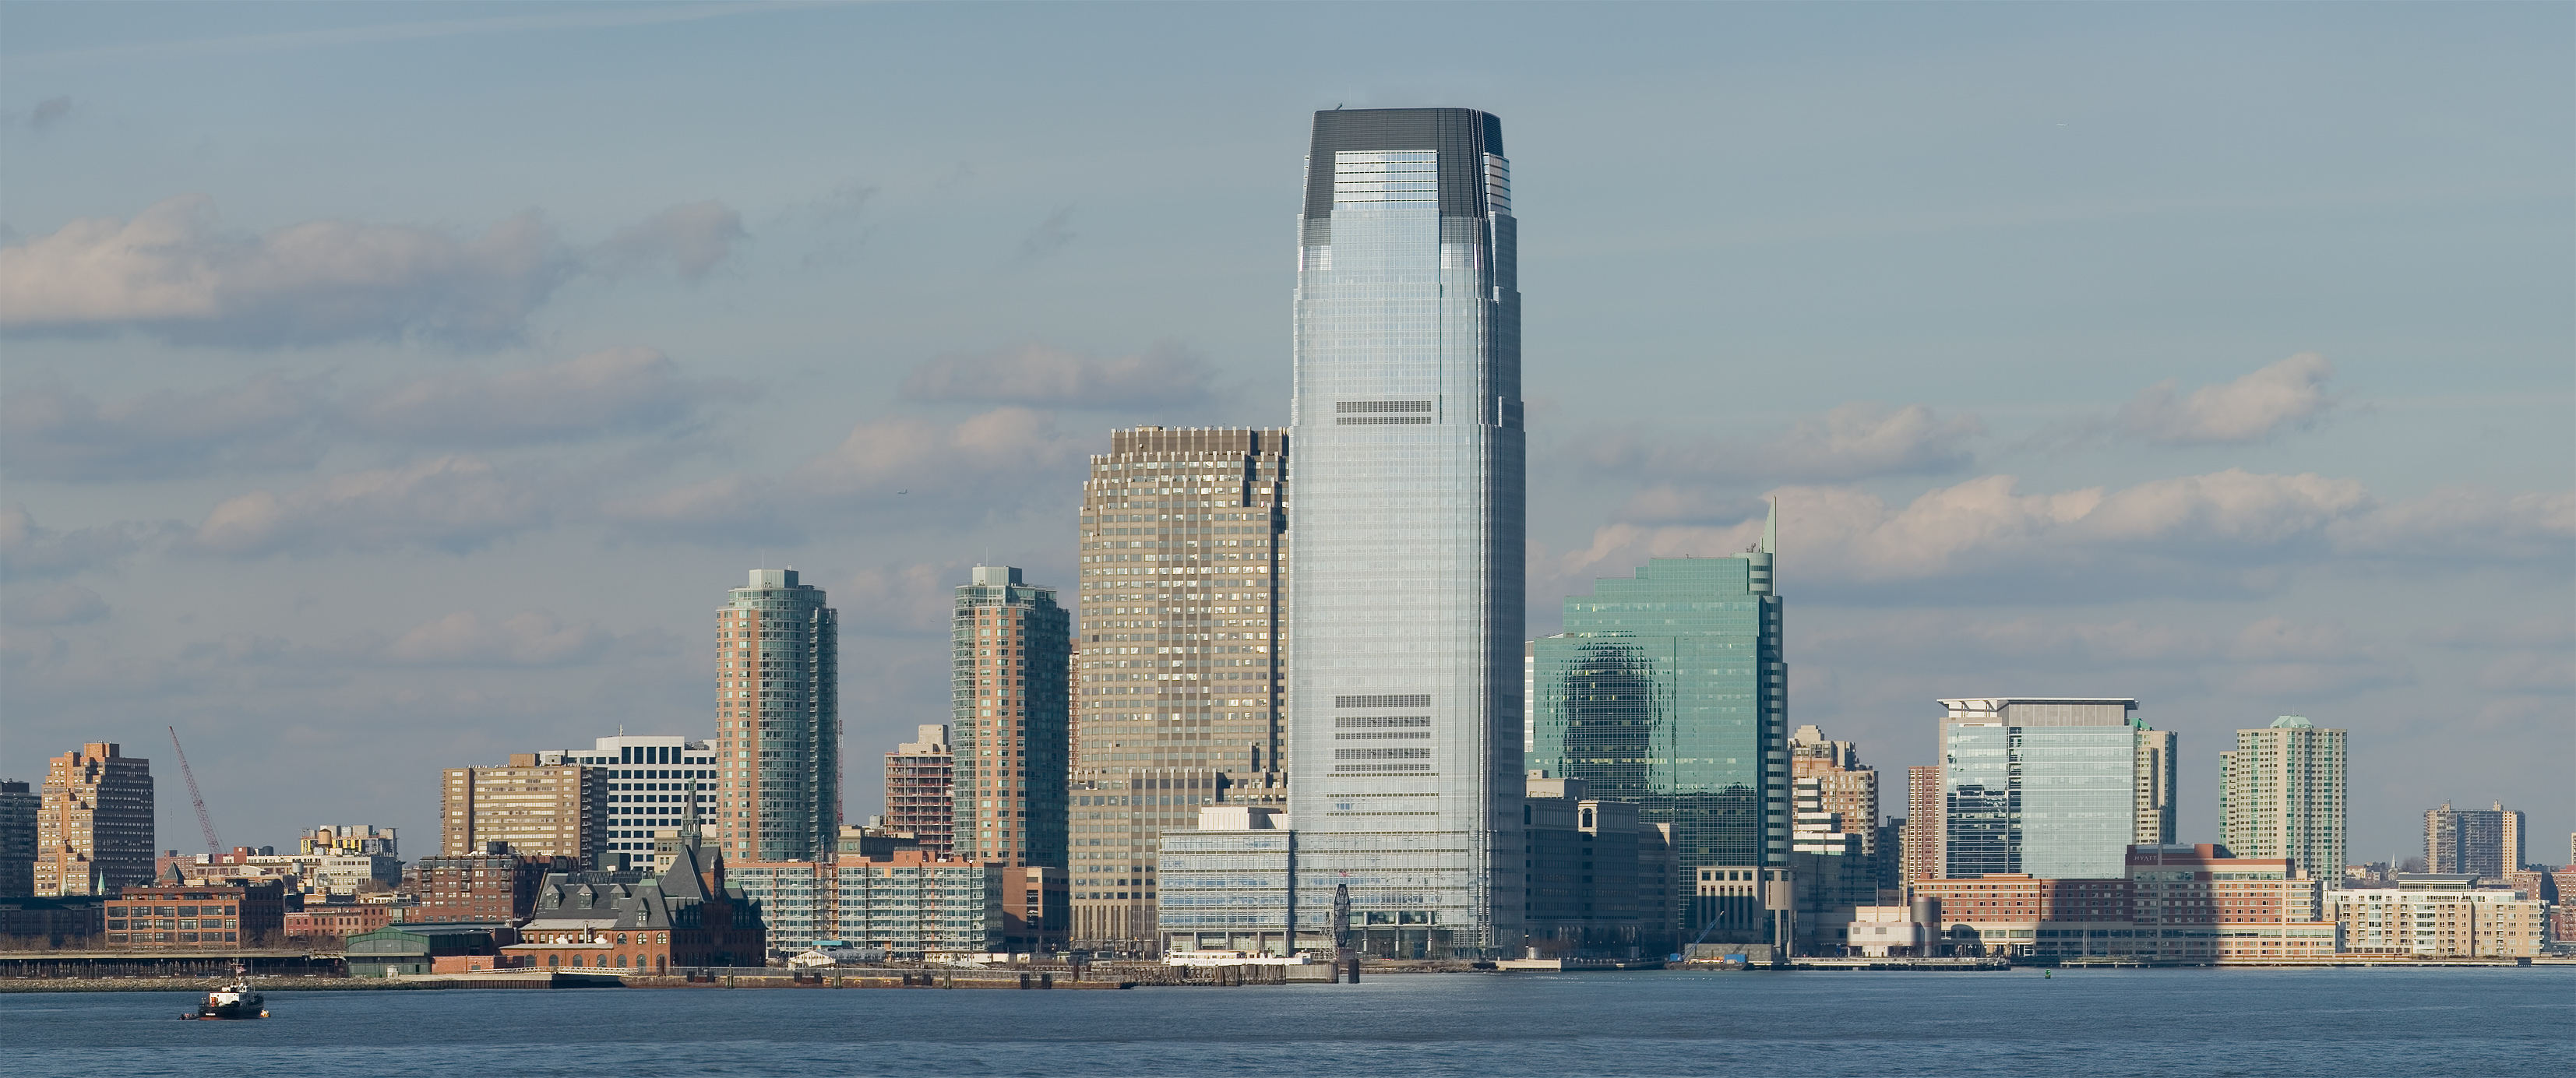 File:Jersey City Skyline - Jan 2006.jpg - Wikimedia Commonsjersey city city